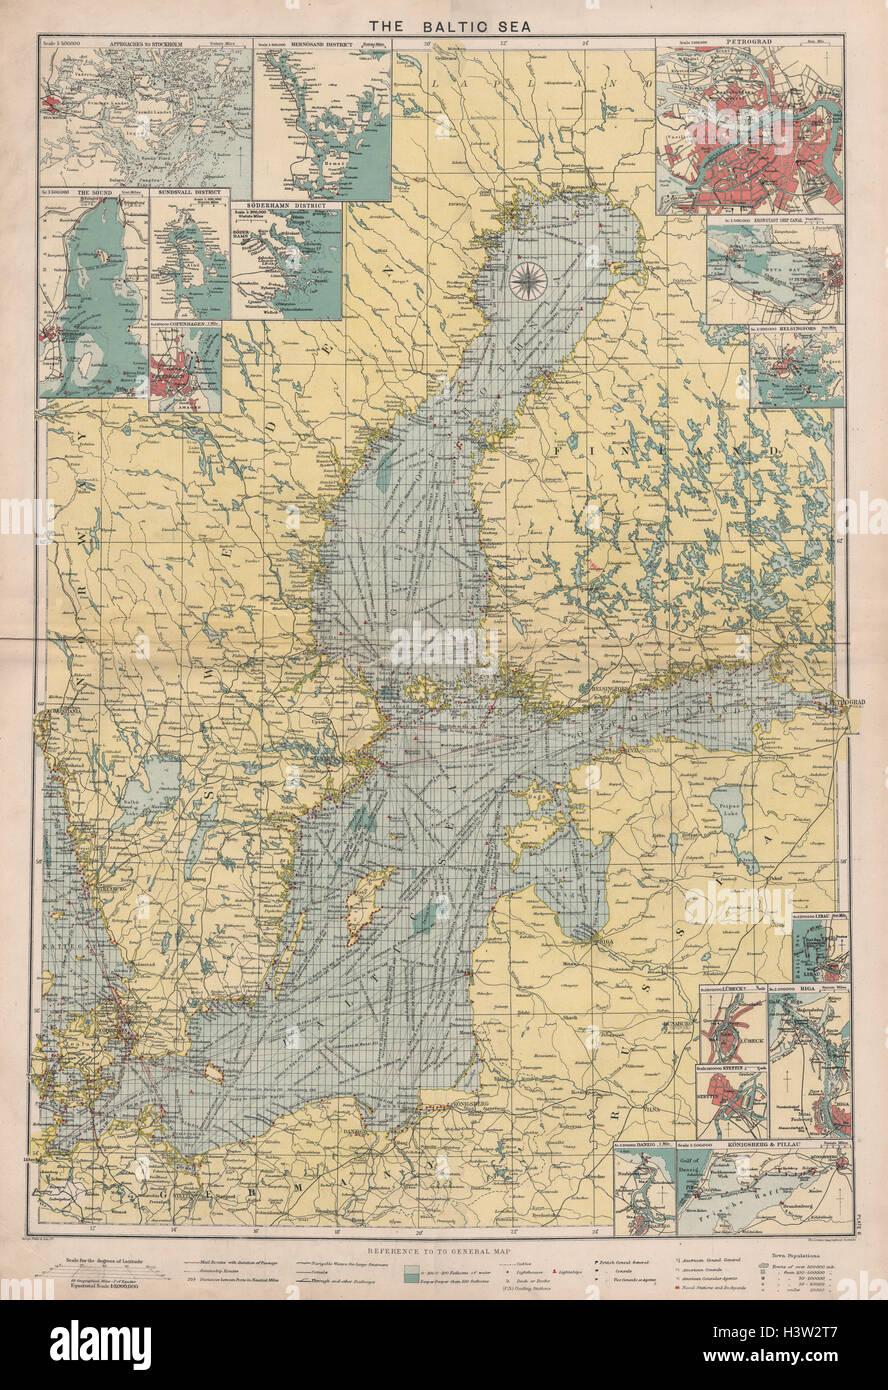 Baltic Sea Map Stock Photos & Baltic Sea Map Stock Images - Alamy